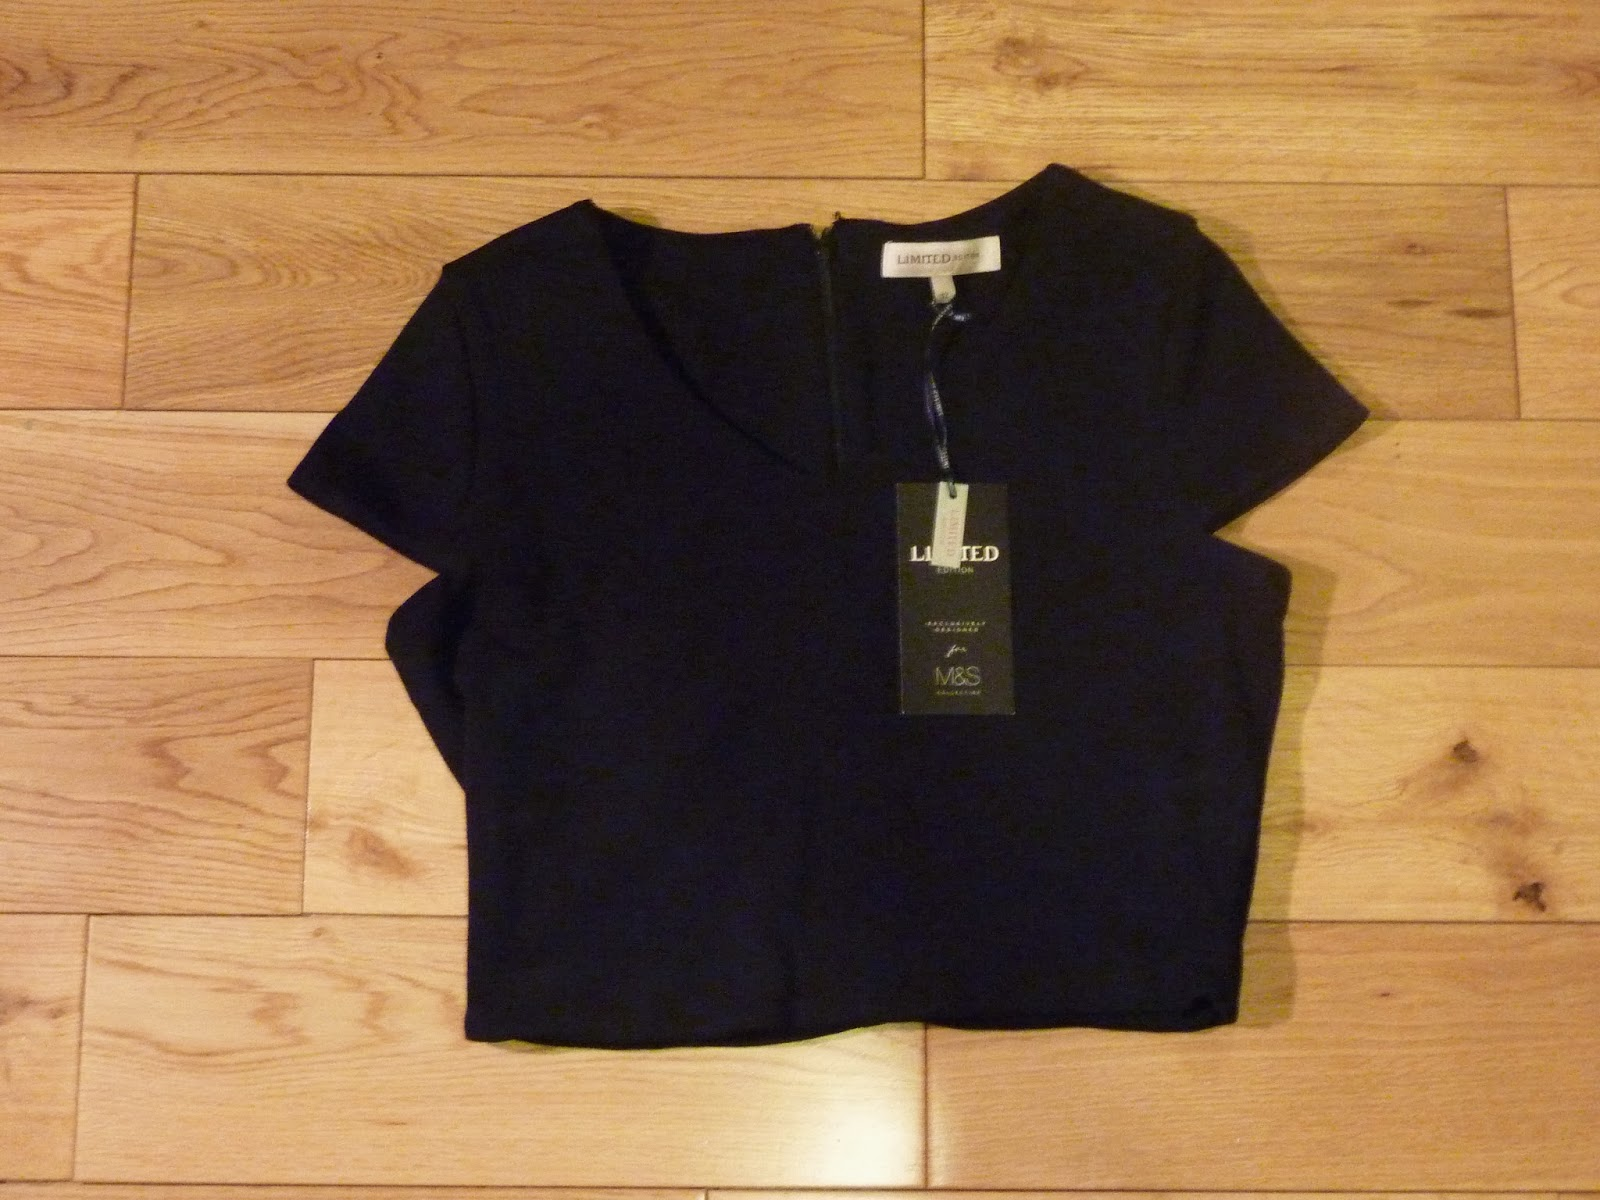 M&S Black Tailored Crop Top Sale